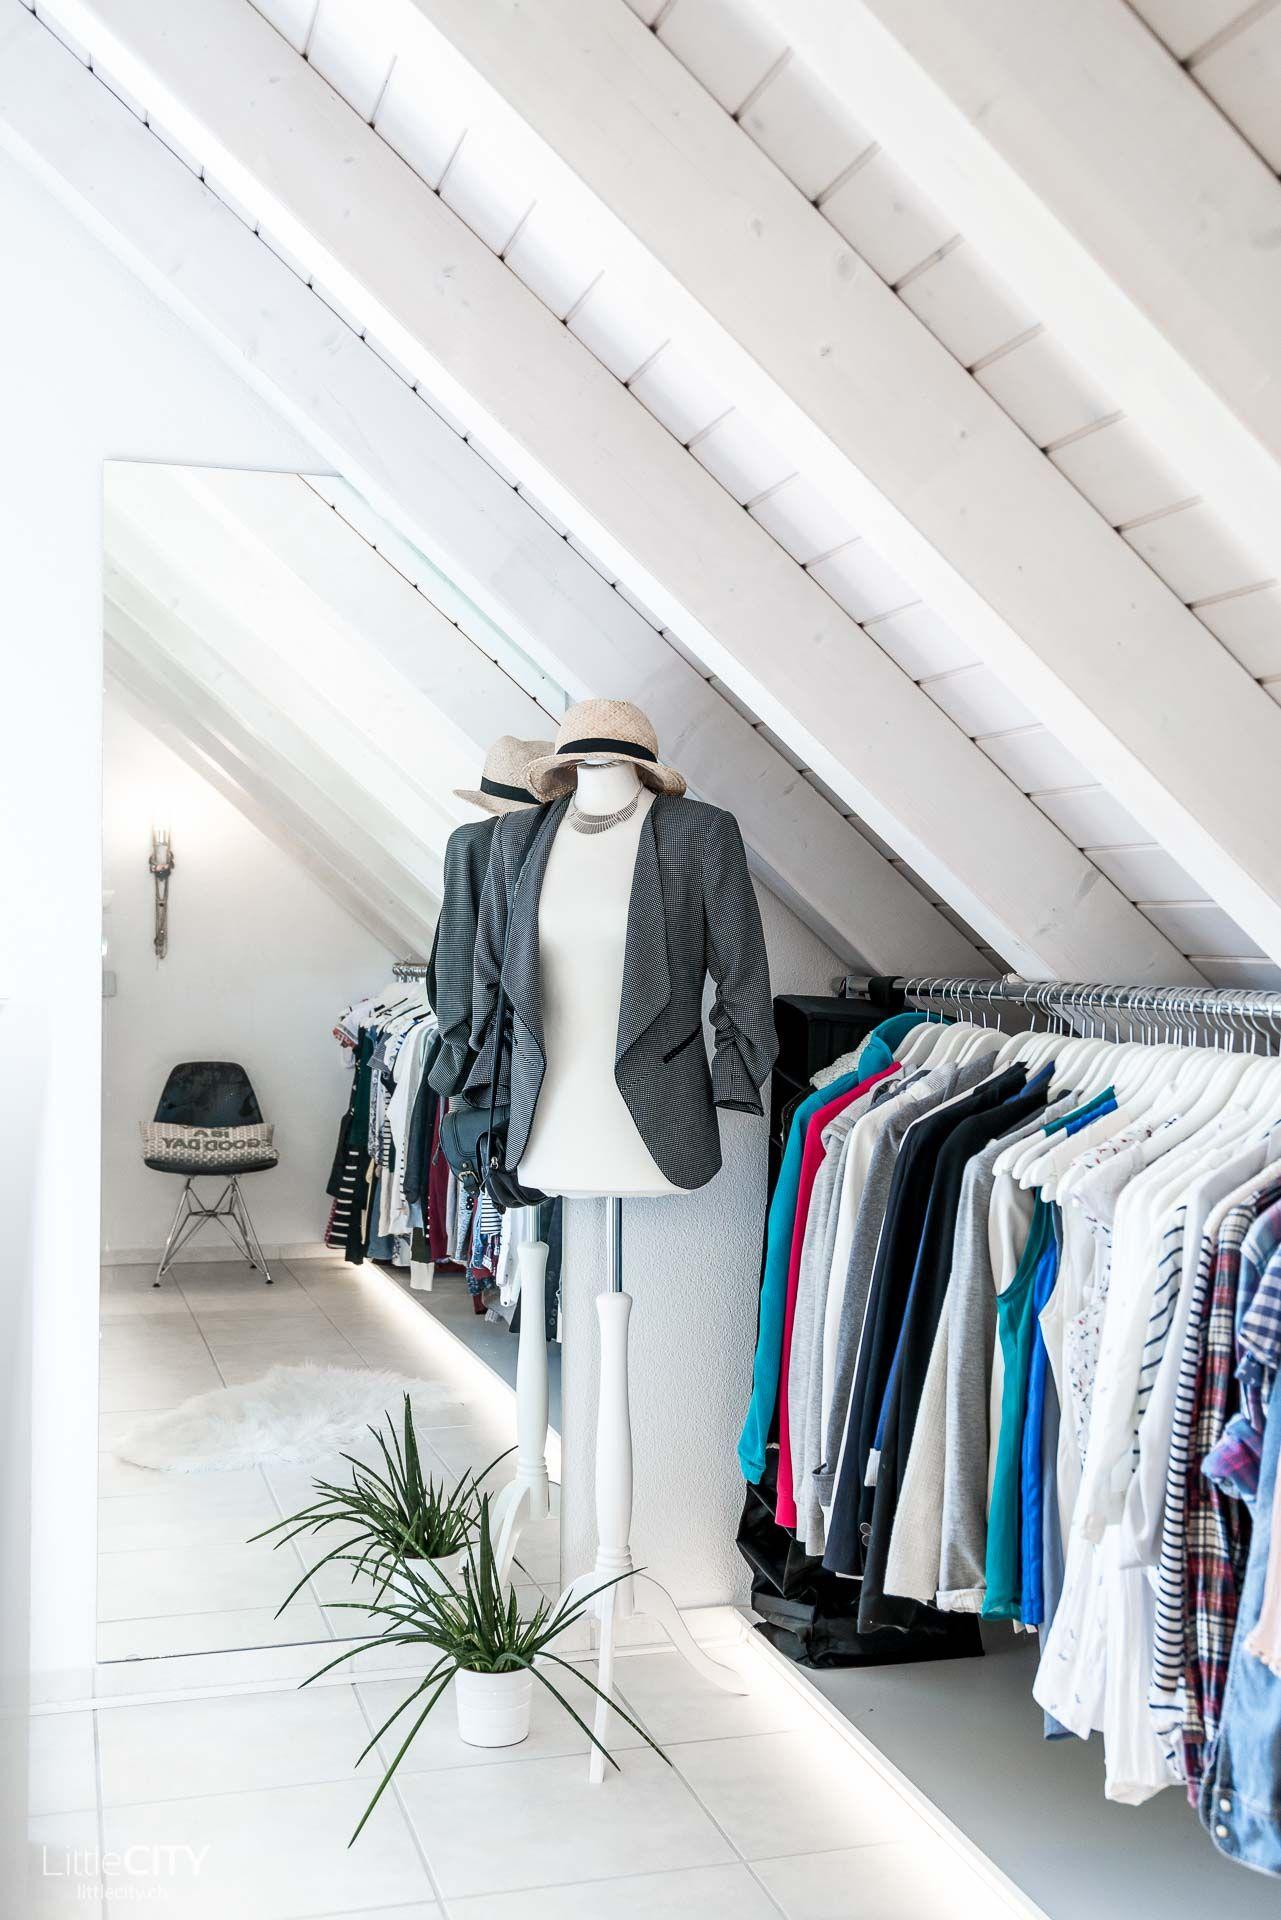 Selbstgebauter Begehbarer Kleiderschrank Begehbarer